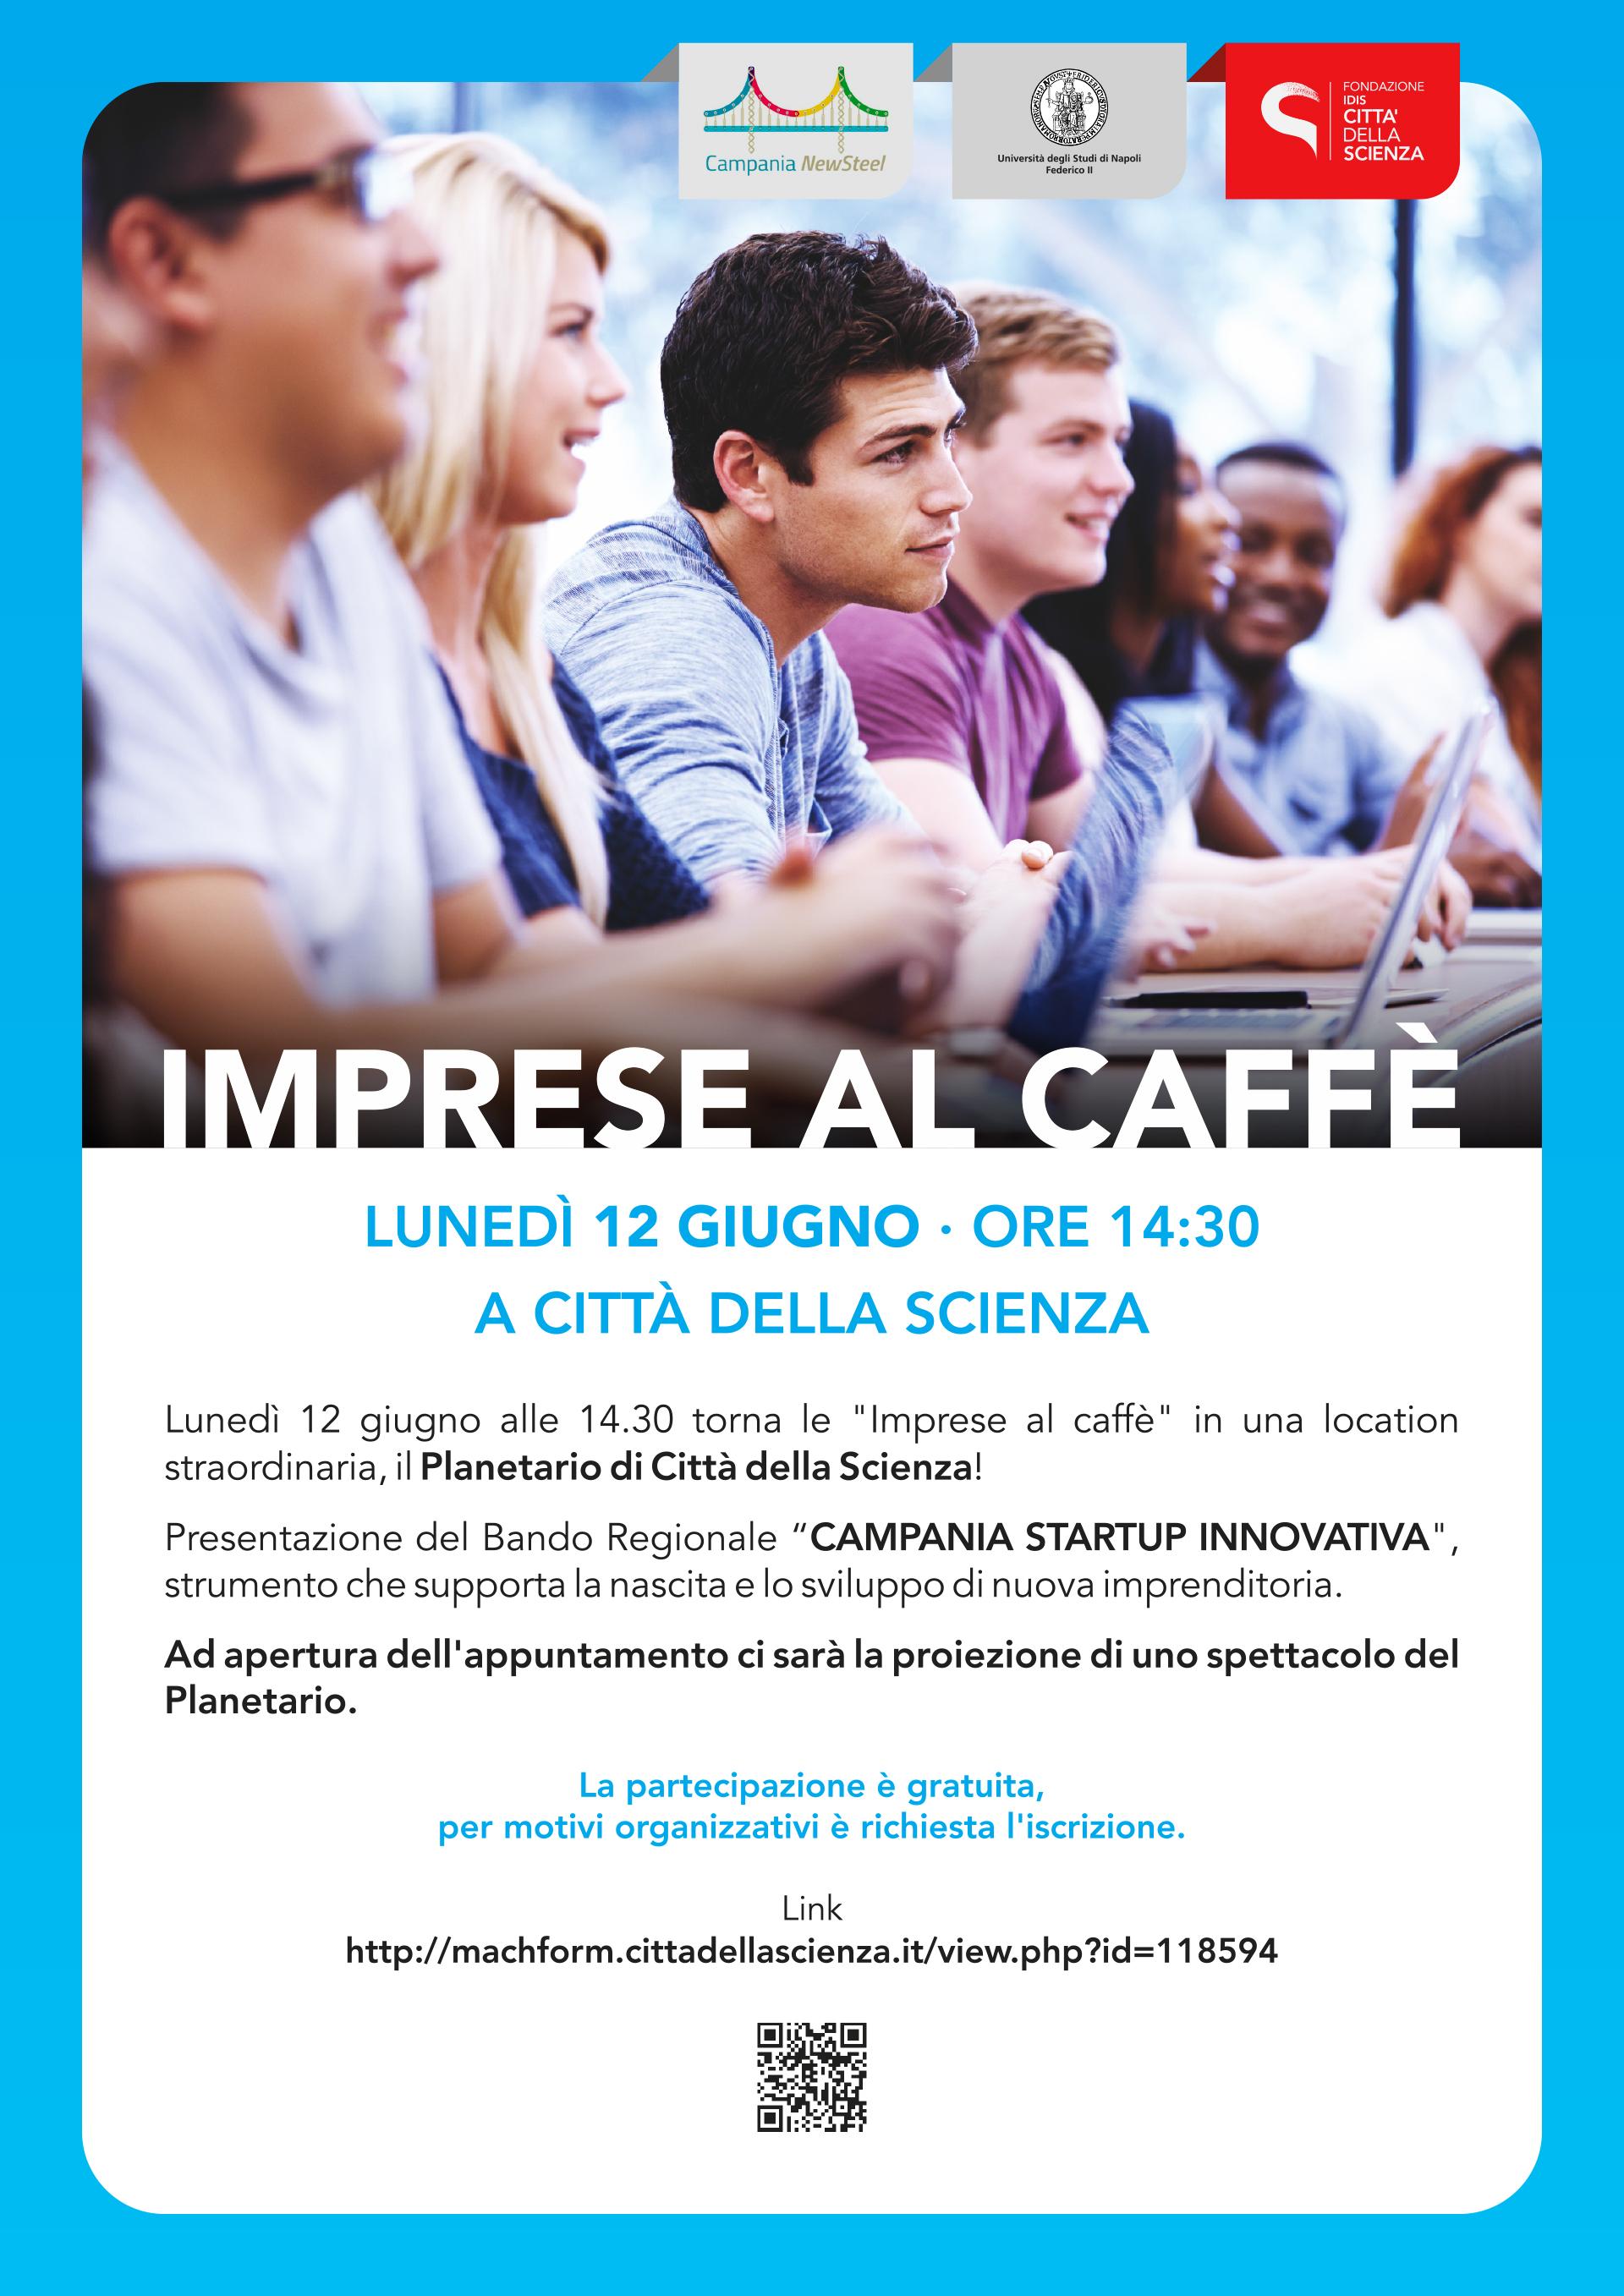 A3_IMPRESE_AL_CAFFE_004.cdr